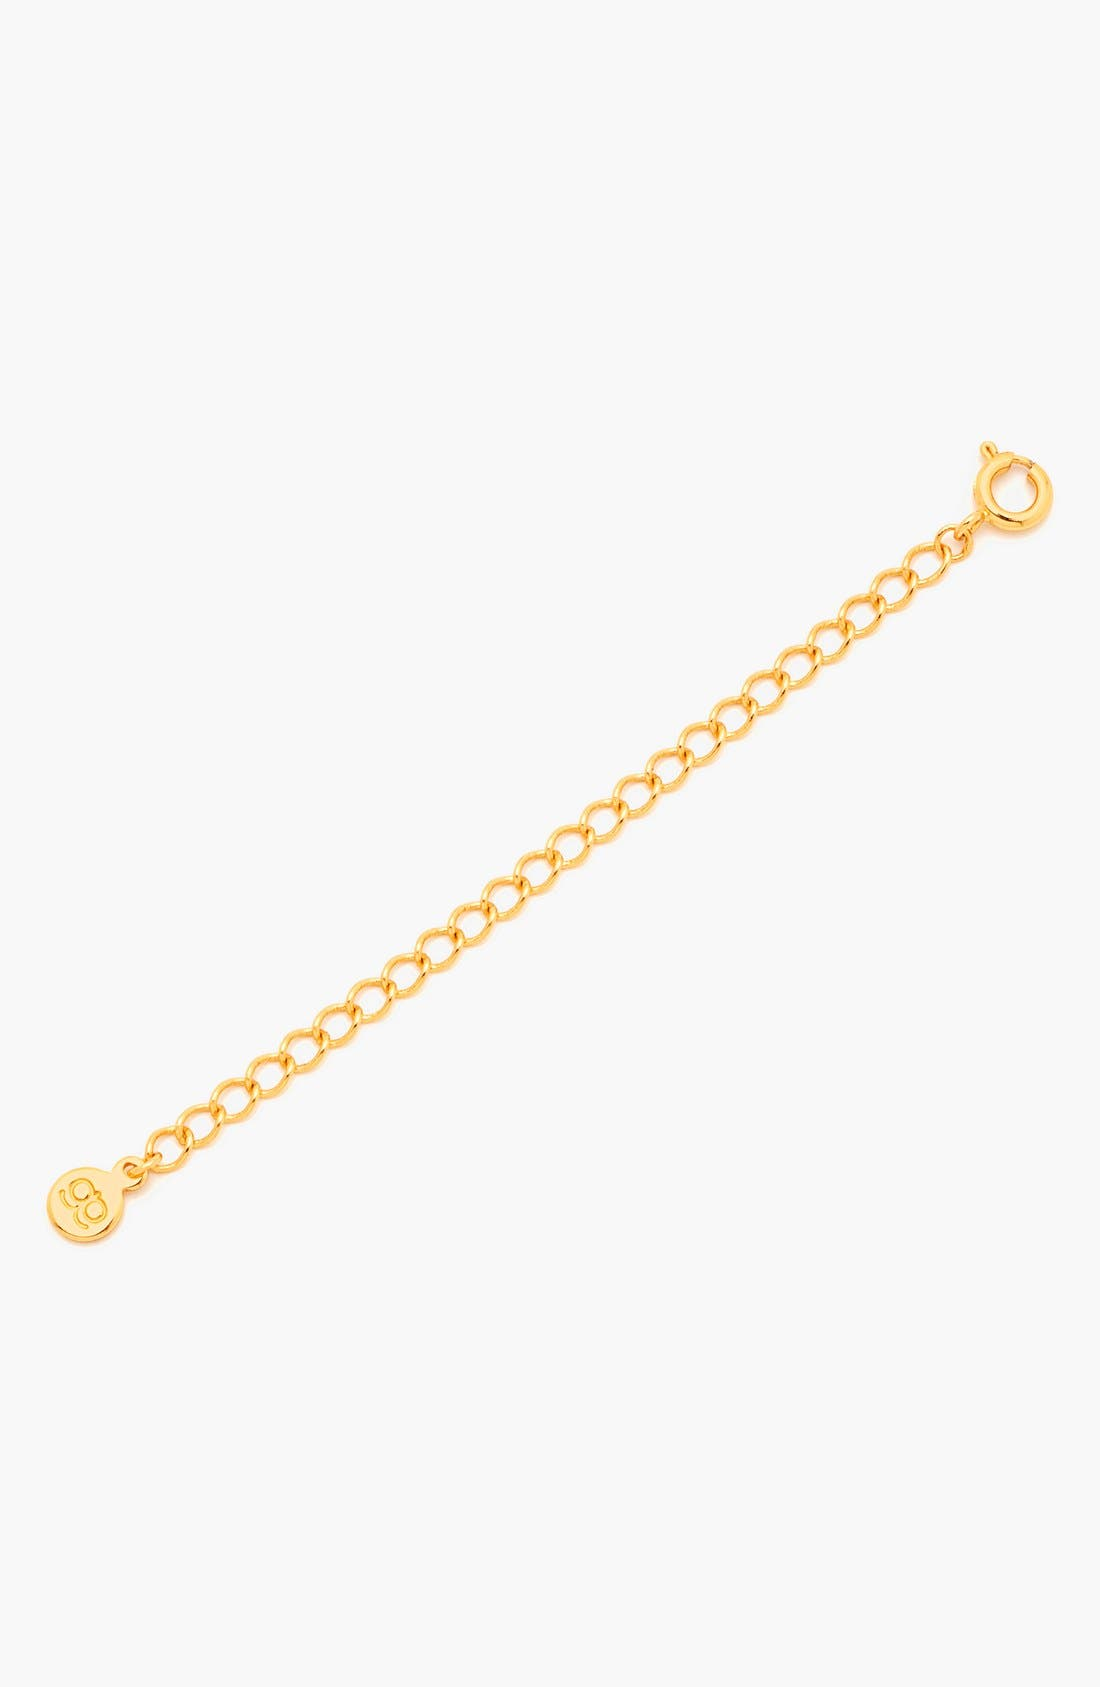 GORJANA Necklace Extender, Main, color, GOLD